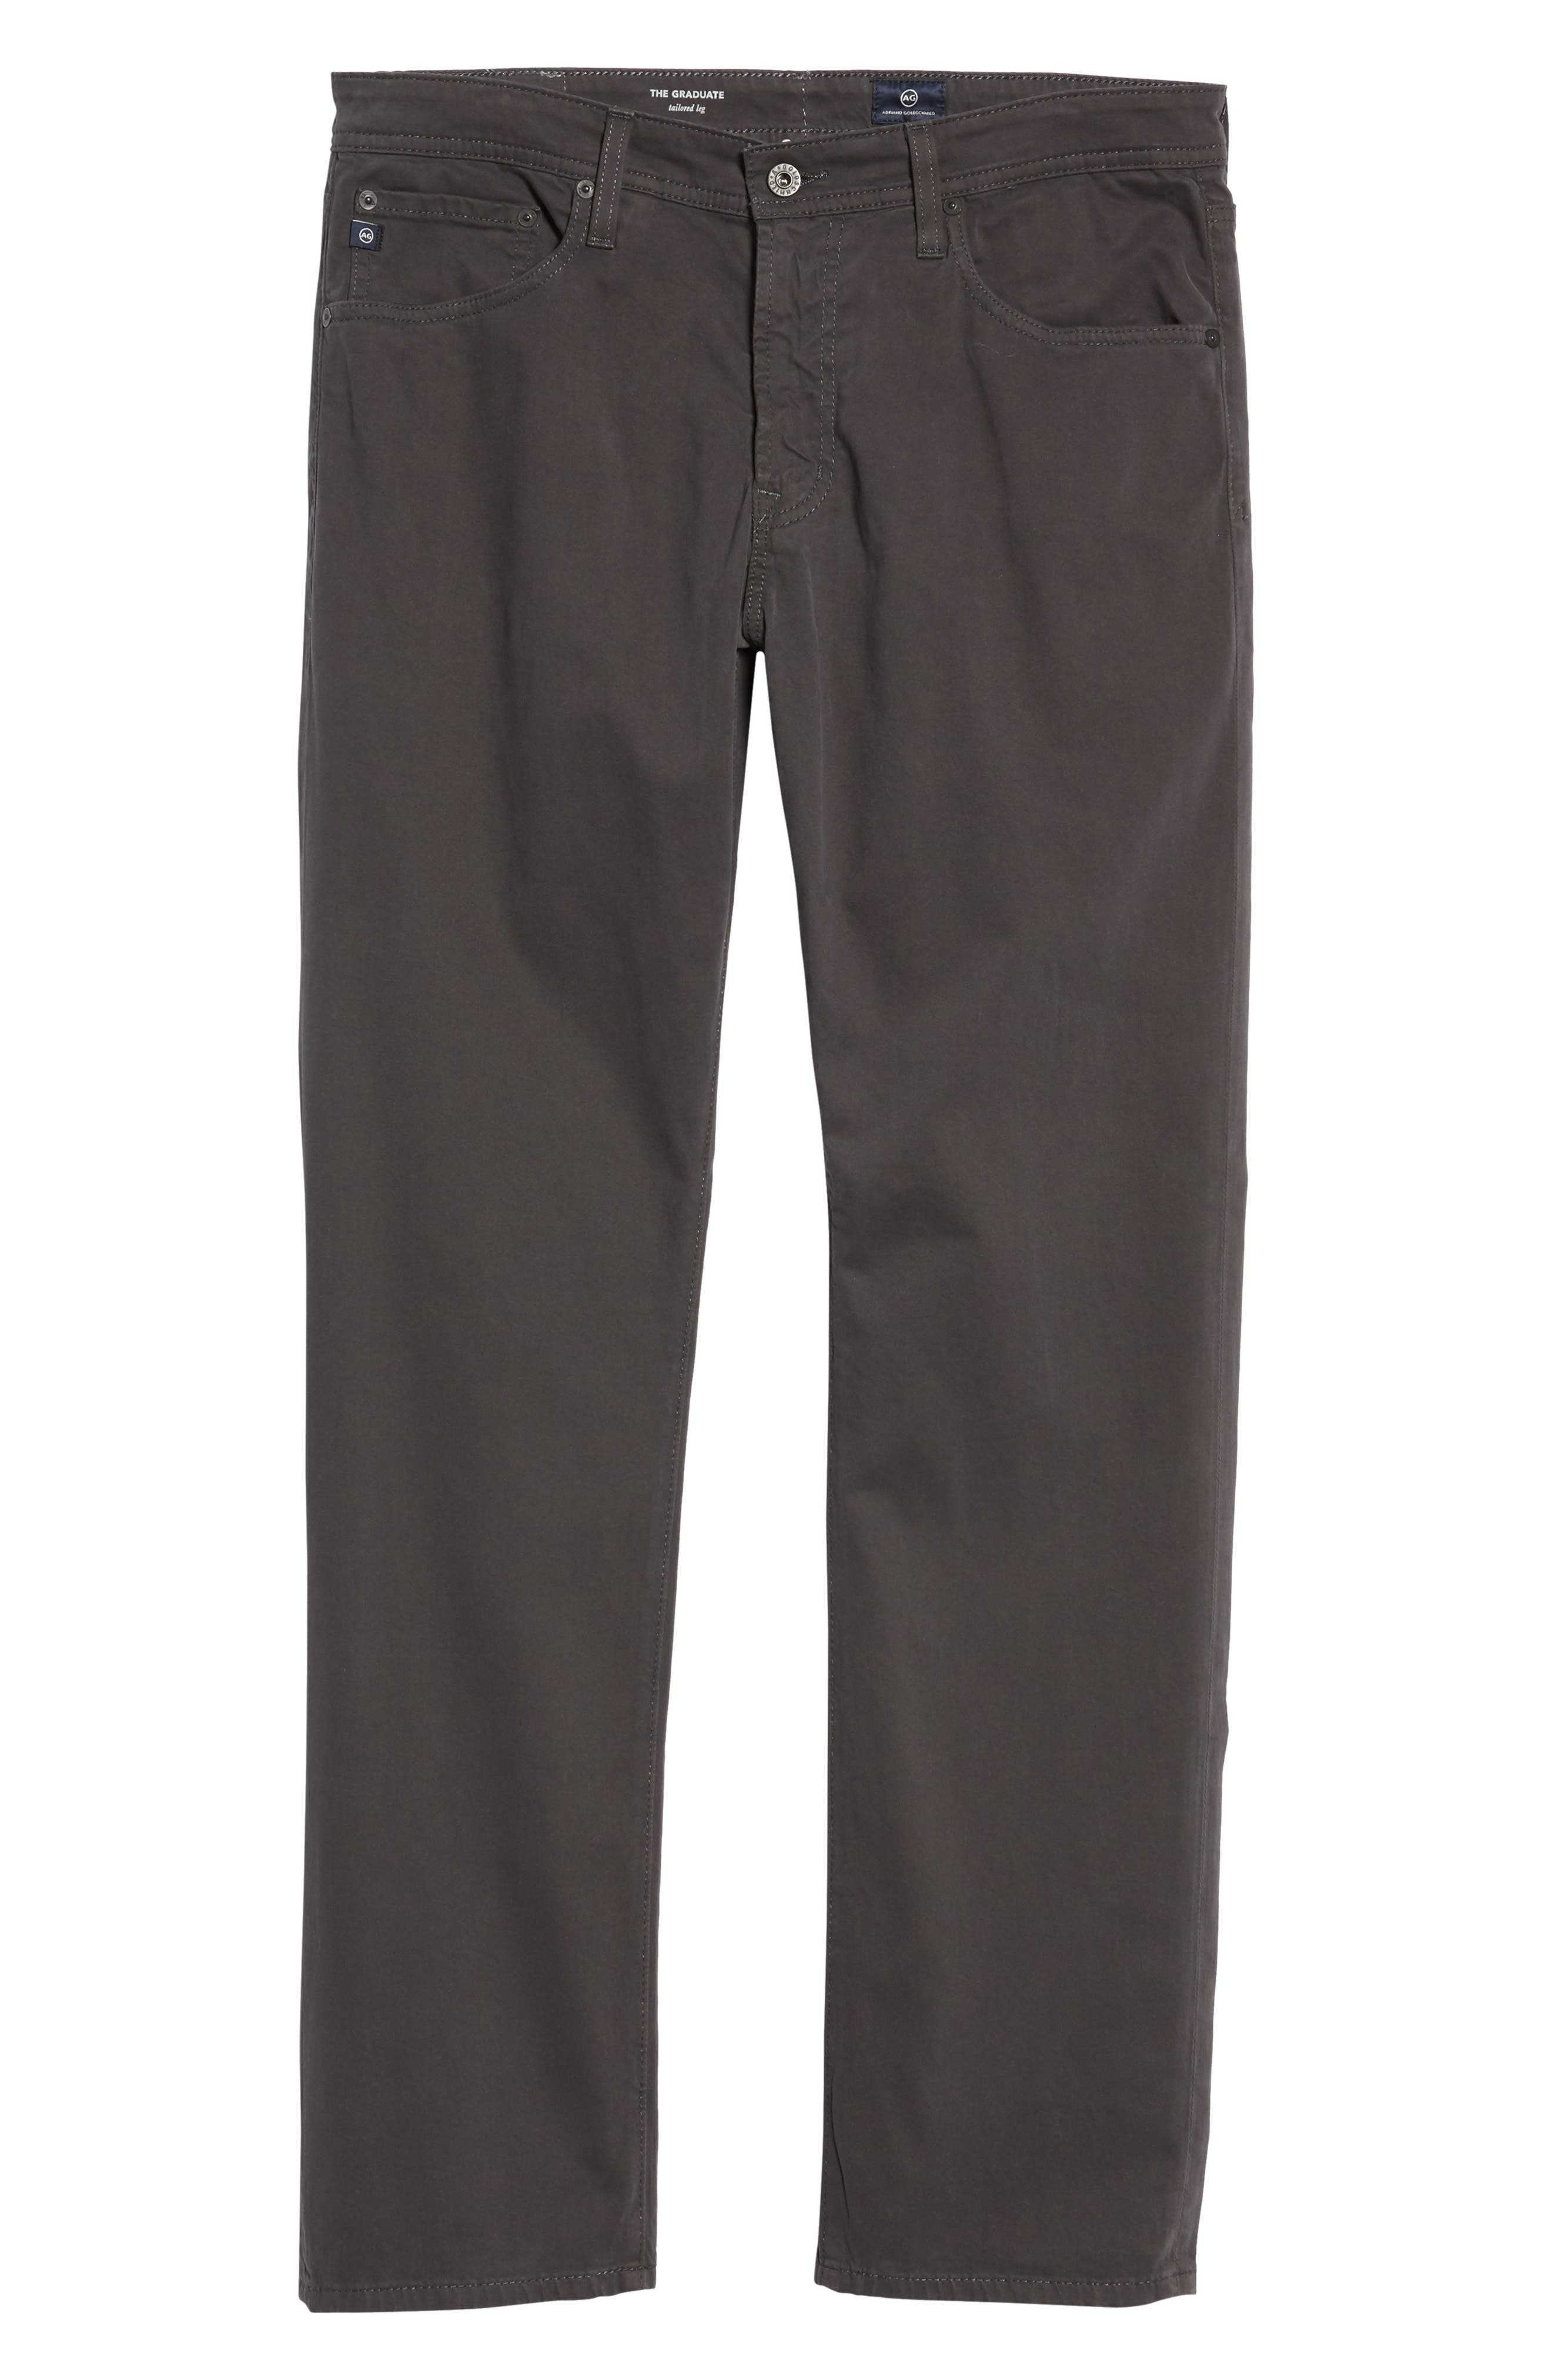 Moncler Pantalones Tailored granate